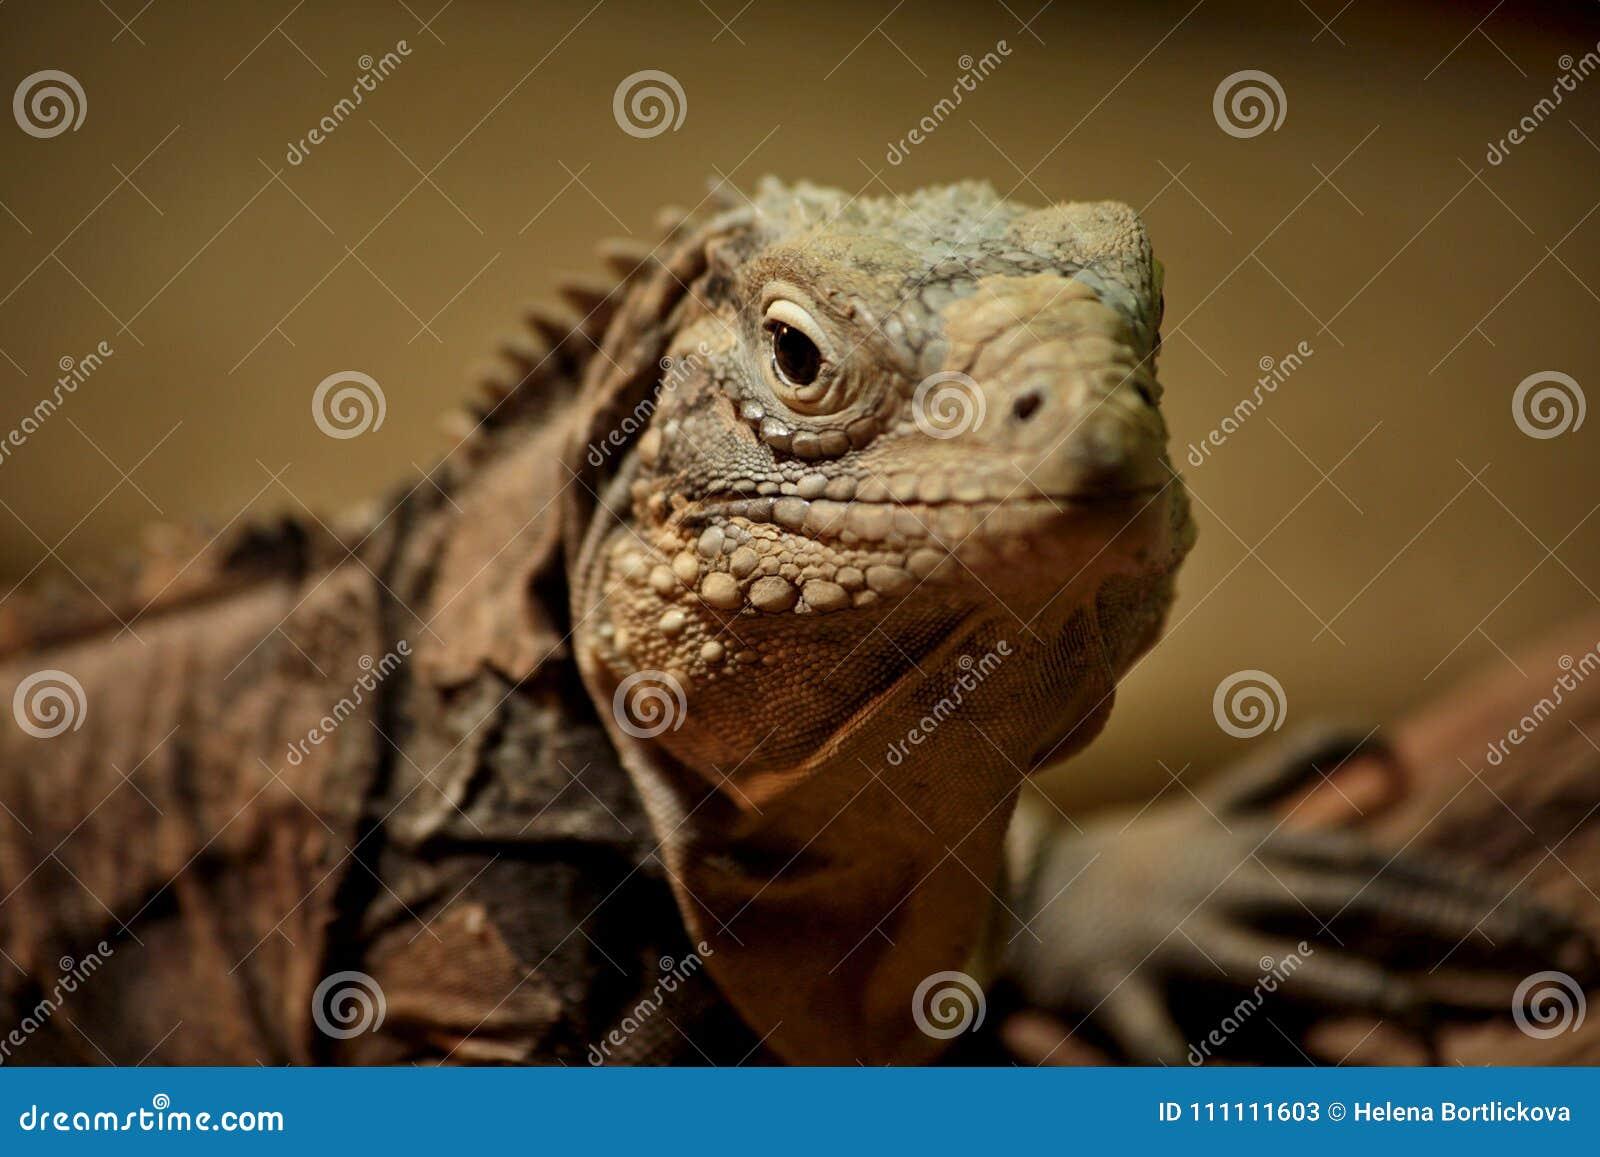 Leguanmakrodetail